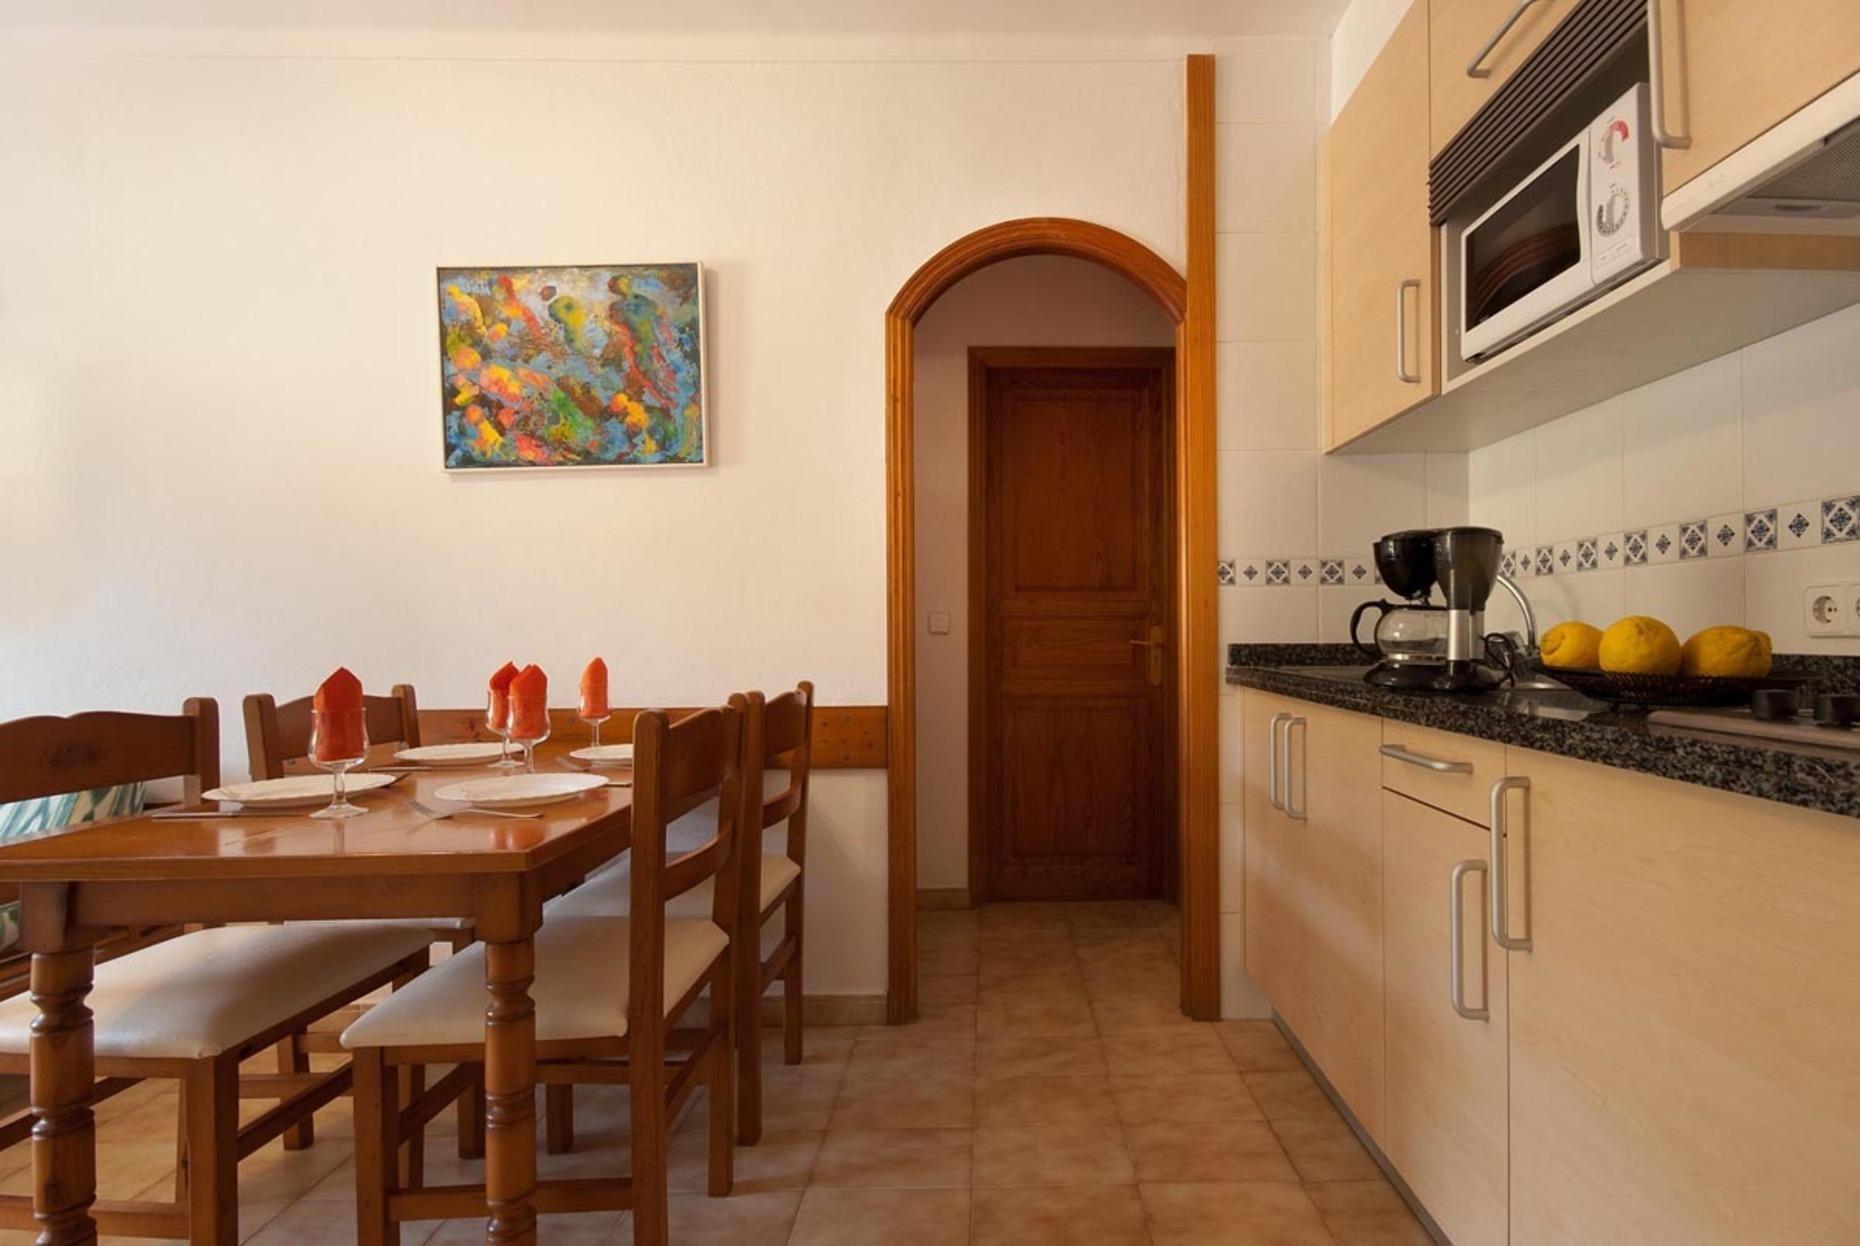 103217 -  Apartment in Cala Sant Vicenç